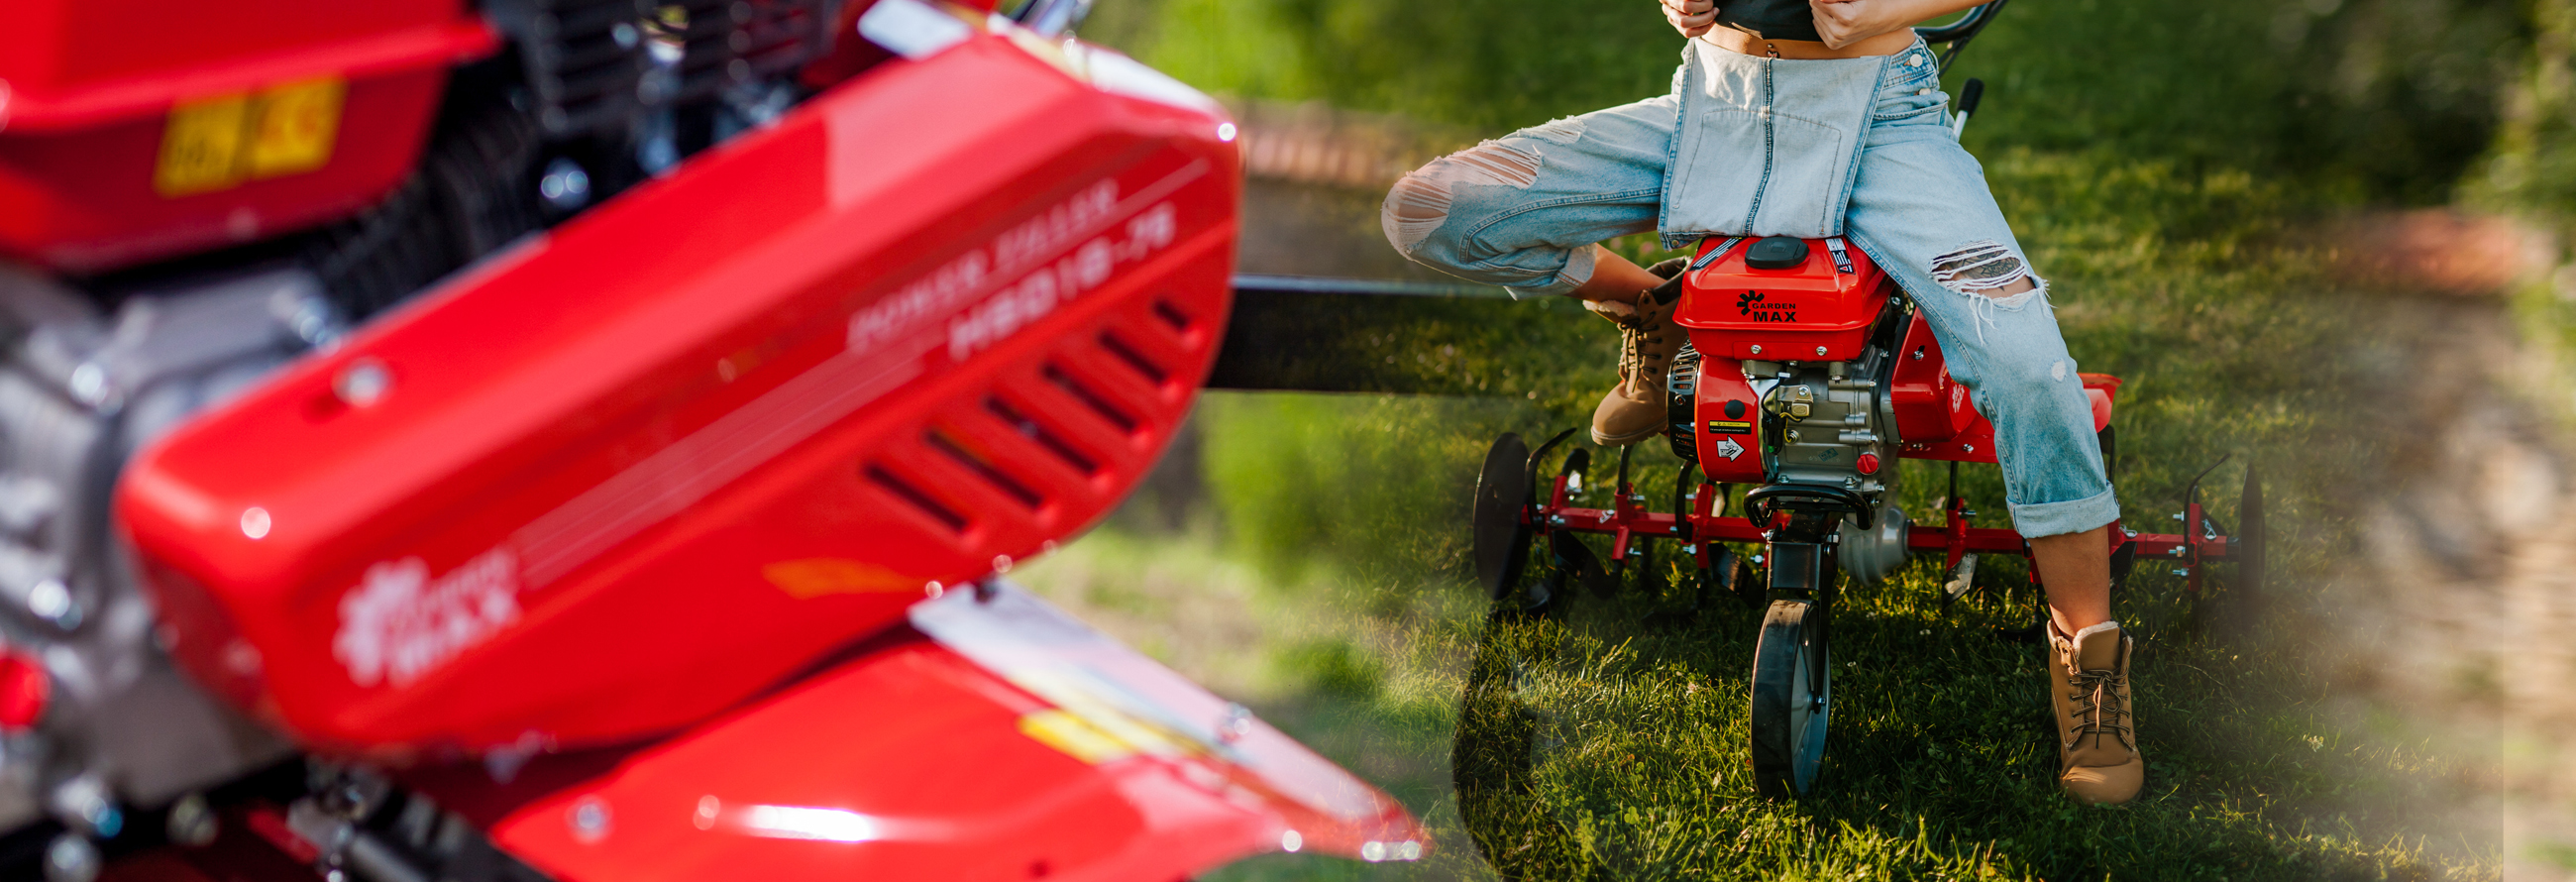 gardenmax GardenMAX 1G-75R